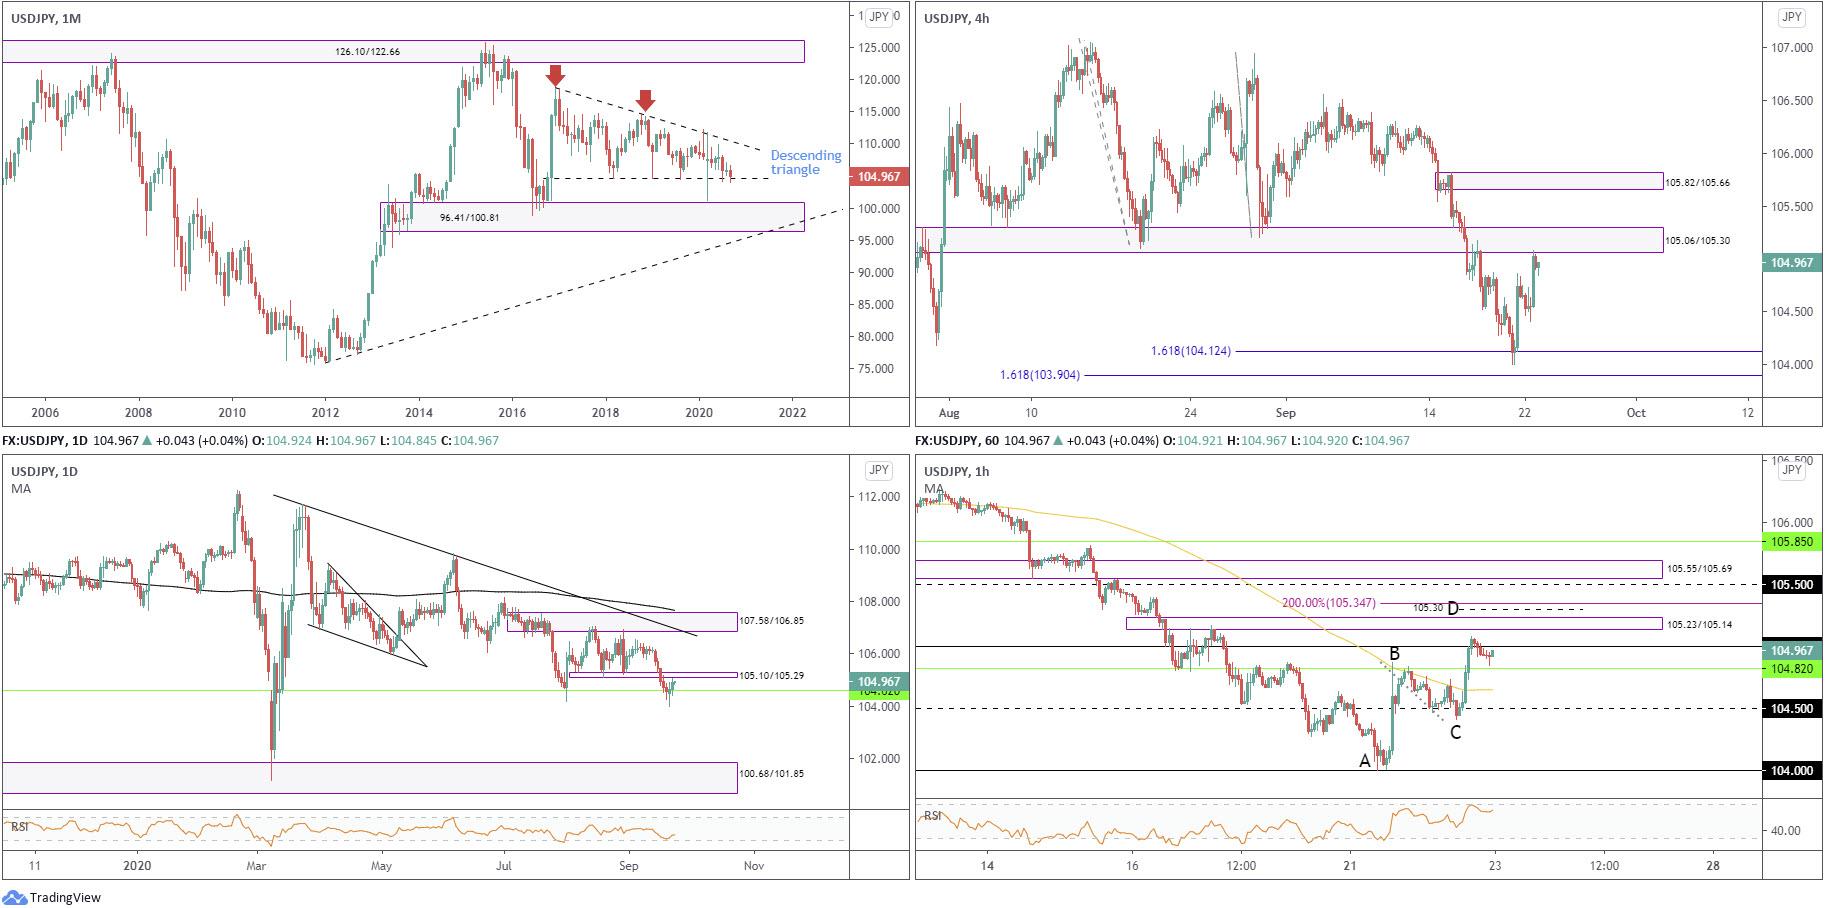 September 23rd 2020: USD/JPY Establishing Support from Monthly Descending Triangle Base, FP Markets